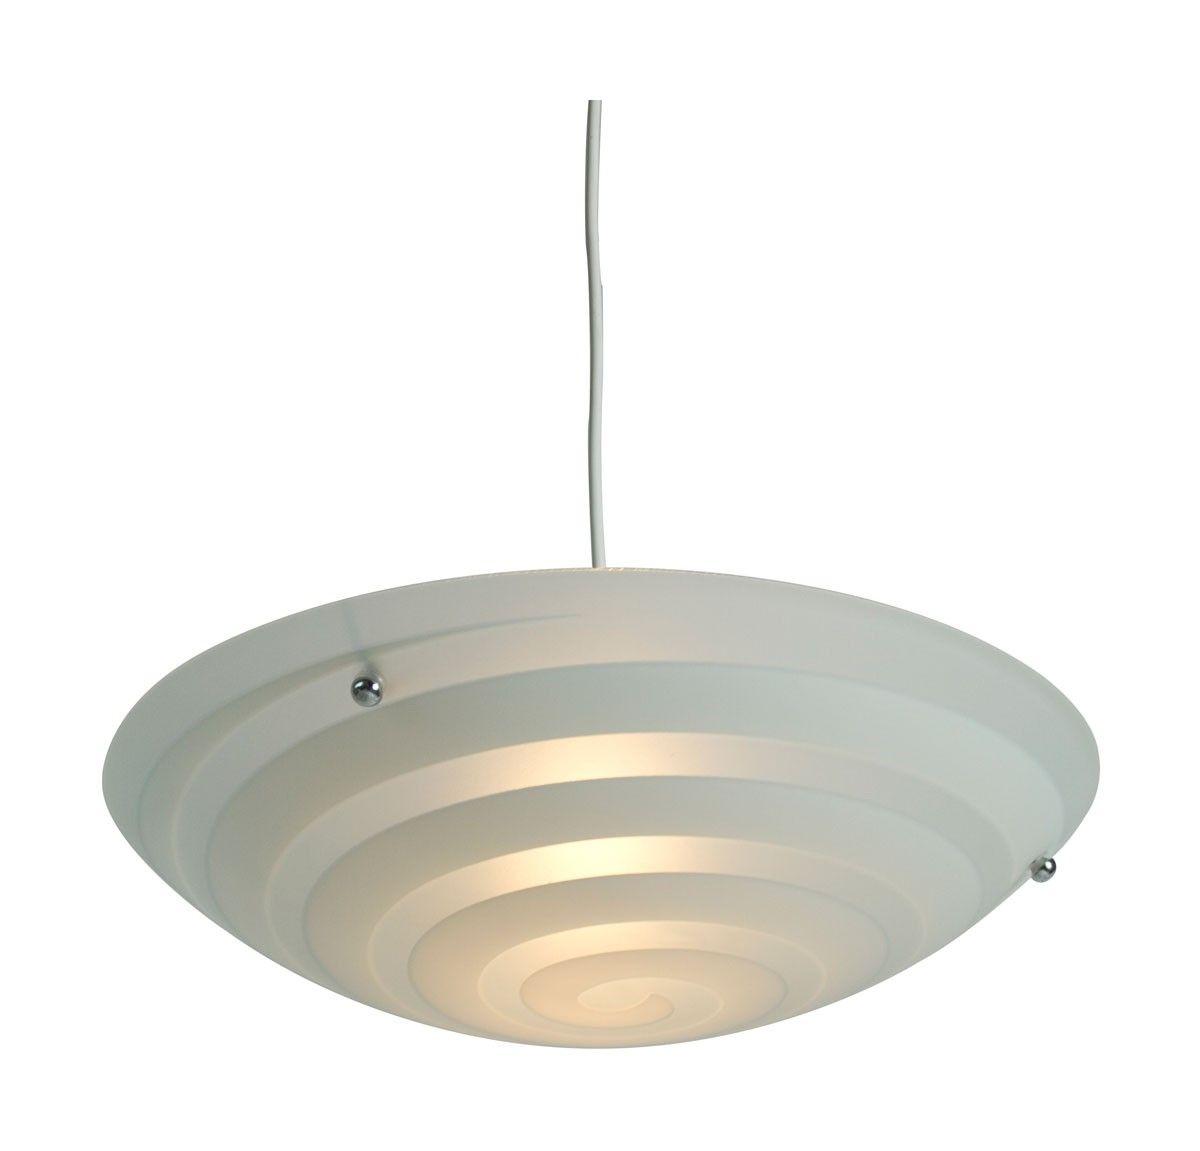 unusual pendant lighting. Wide Range Of Designer Pendant Lighting That Will Surely Illuminate Any Home. Unusual